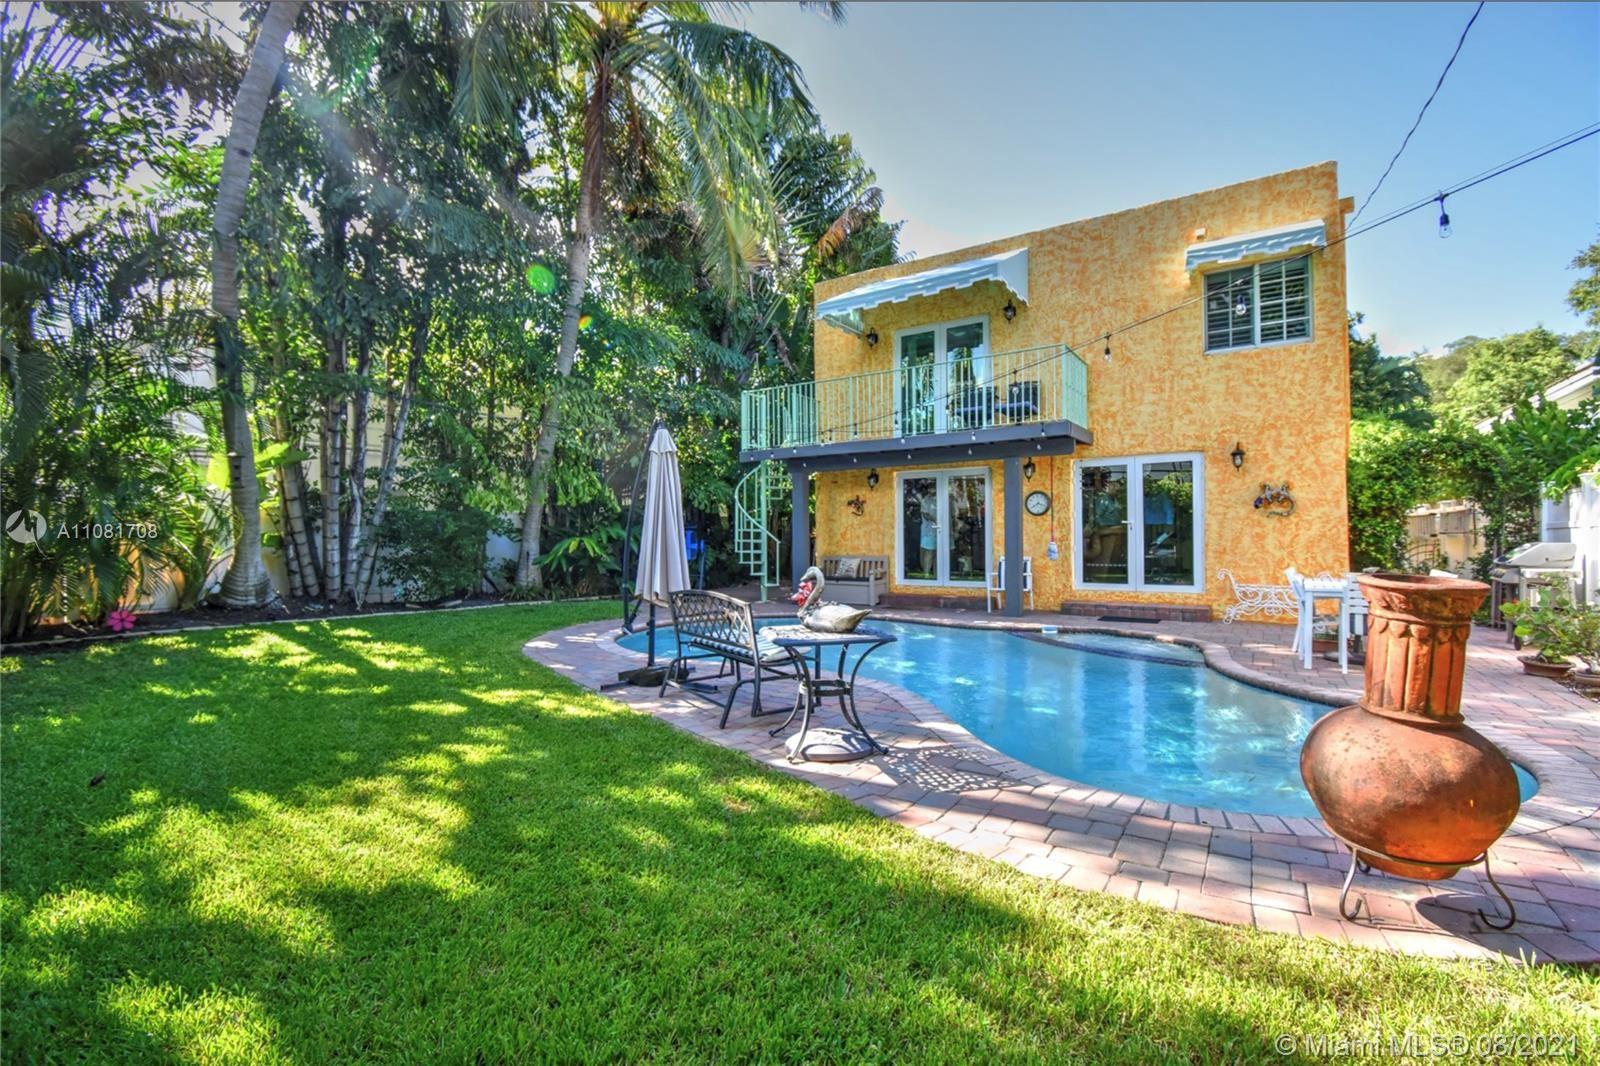 614 SE 5th Ct, Fort Lauderdale, FL 33301 - #: A11081708